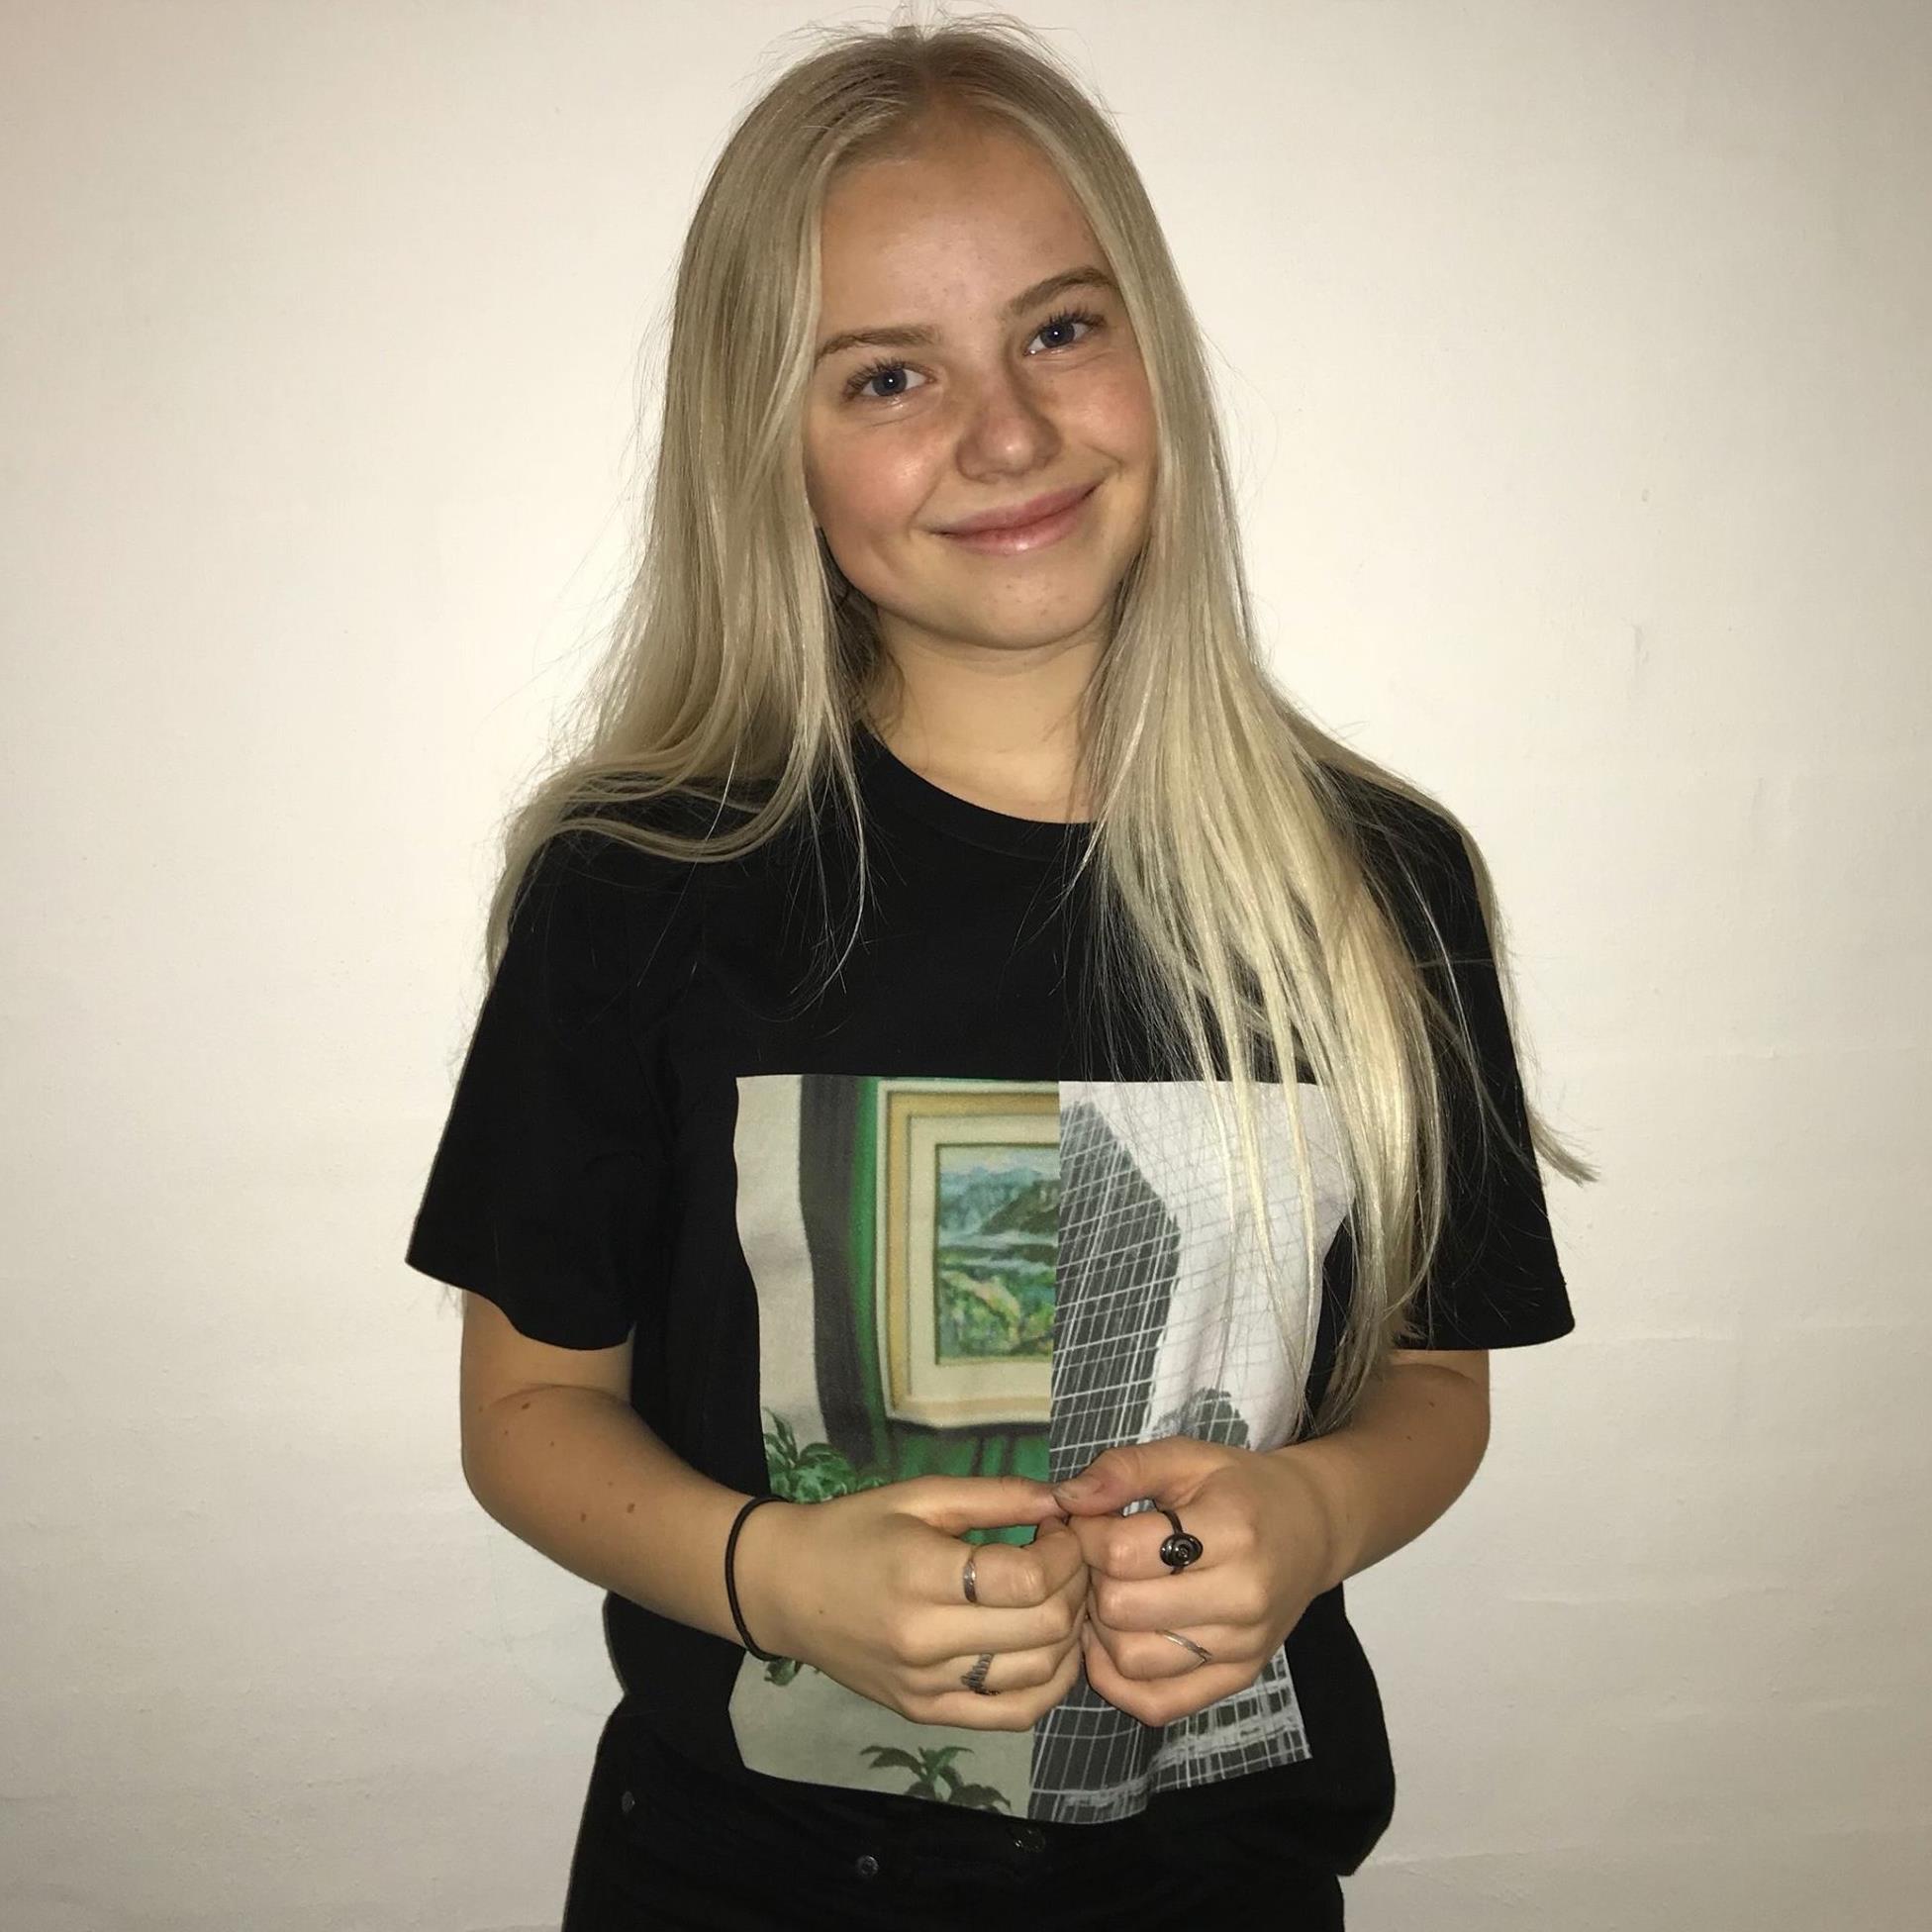 Laura Amalie Boutrup